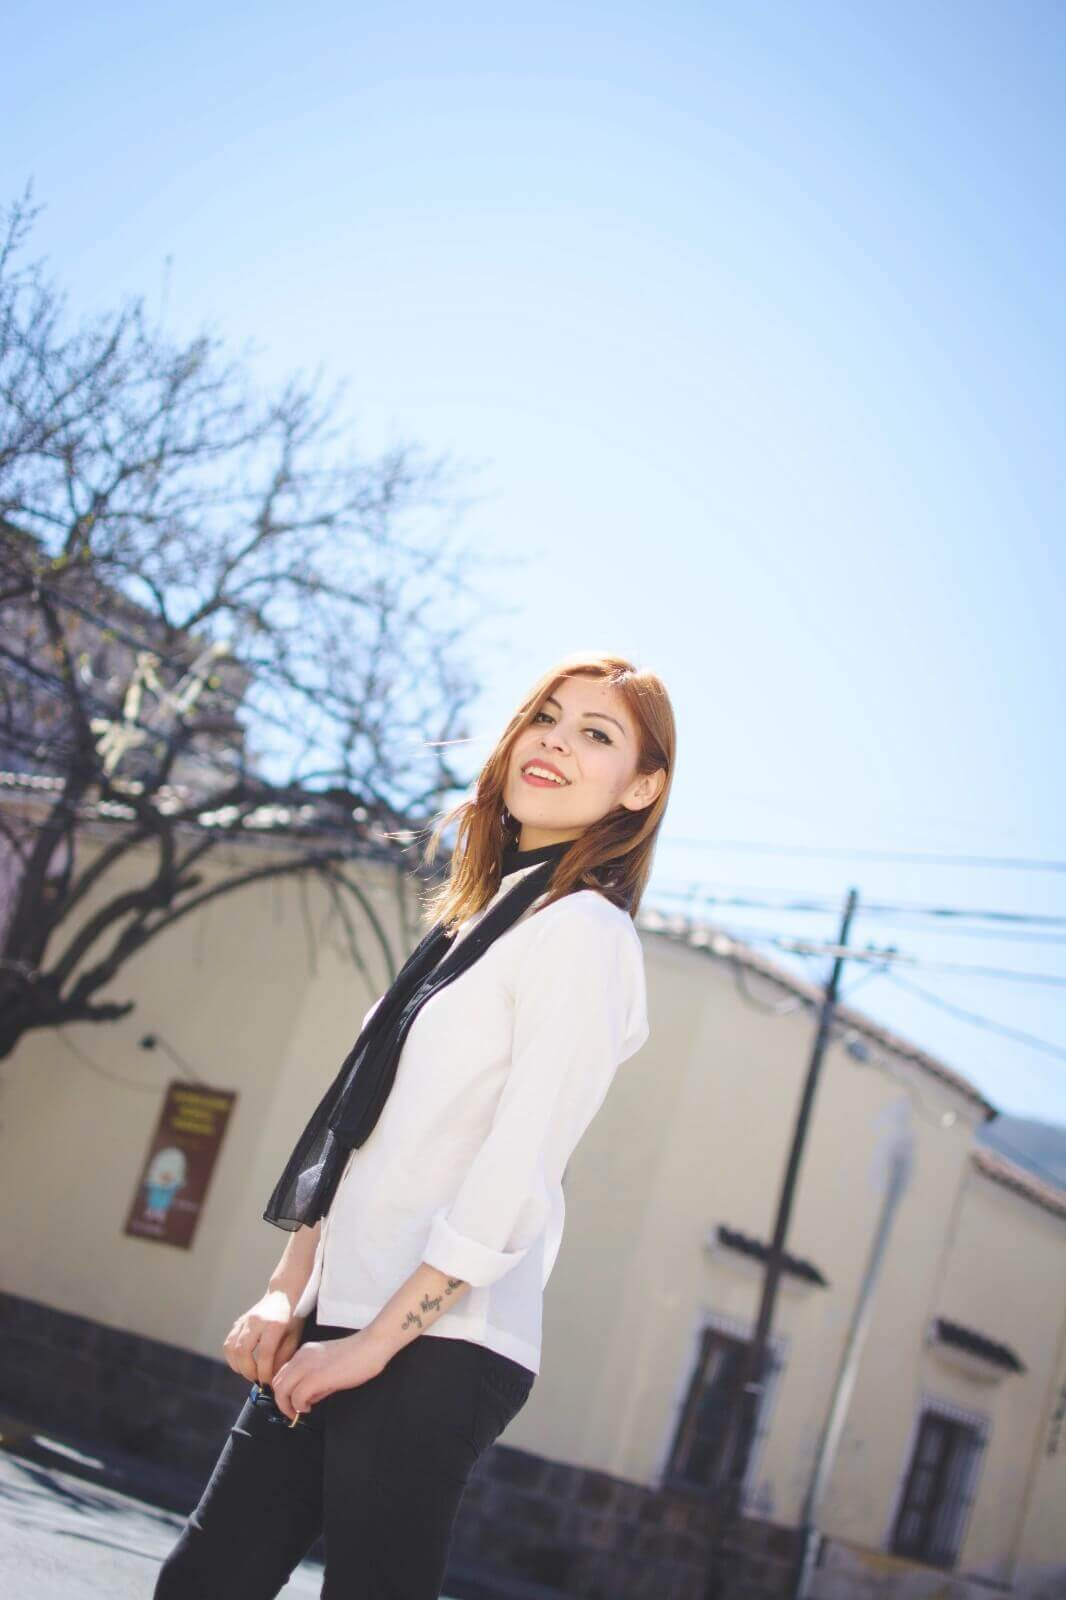 white-shirt-skinny-scarf-black-jeans-zaful-black-suede-shoes-deborah-ferrero-style-by-deb04